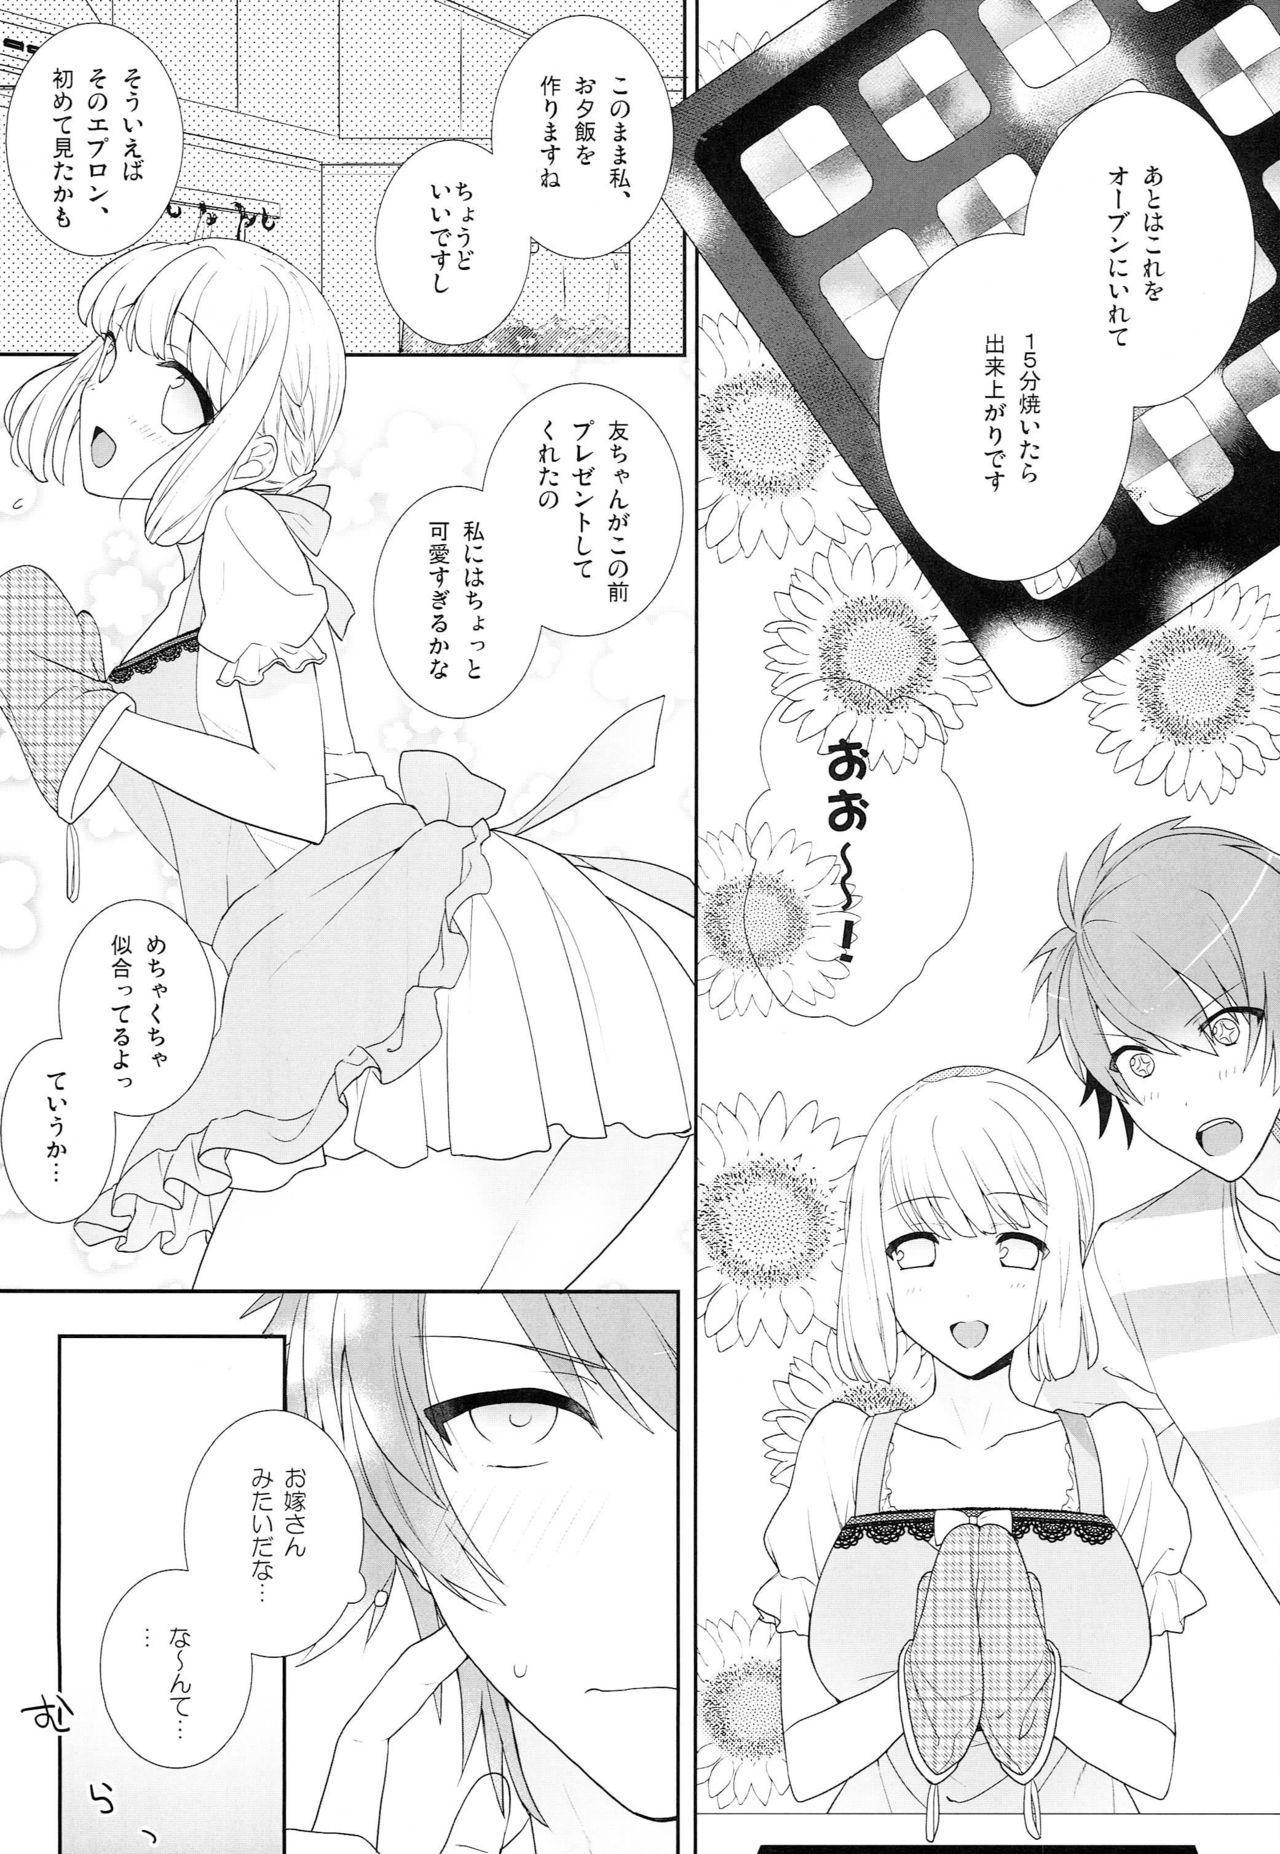 Yumemiru Boyfriend 4